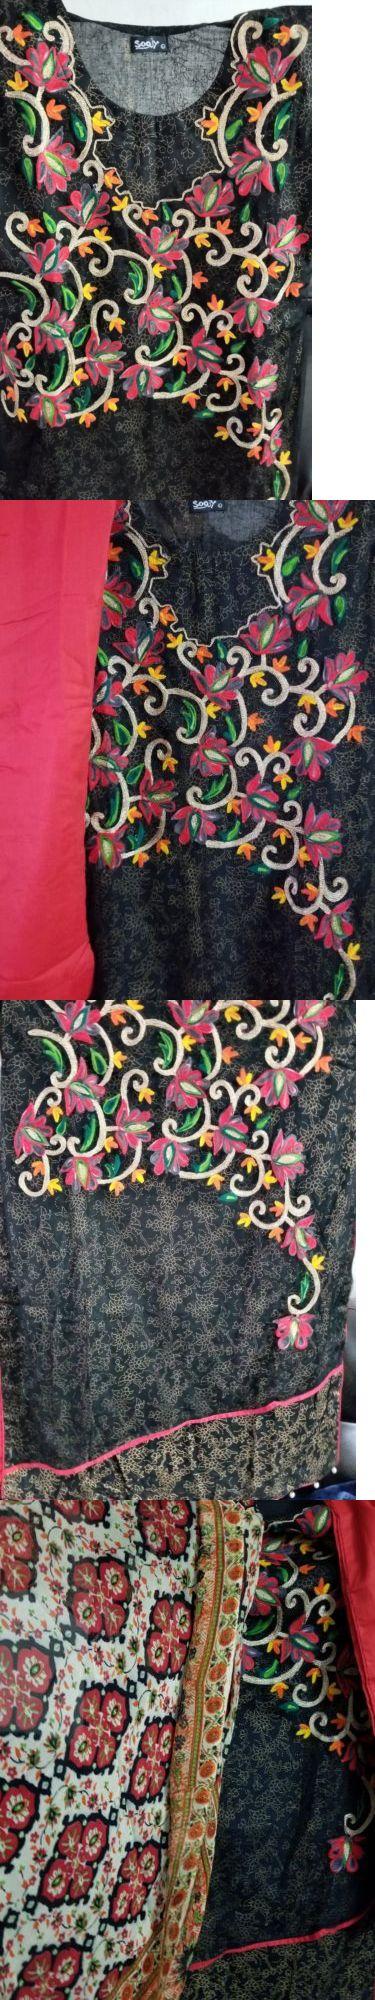 Salwar Kameez 155249: Pakistani Indian Designer Cotton Lawn Stitched Shalwar Kameez Dopatta Large New -> BUY IT NOW ONLY: $46.9 on eBay!